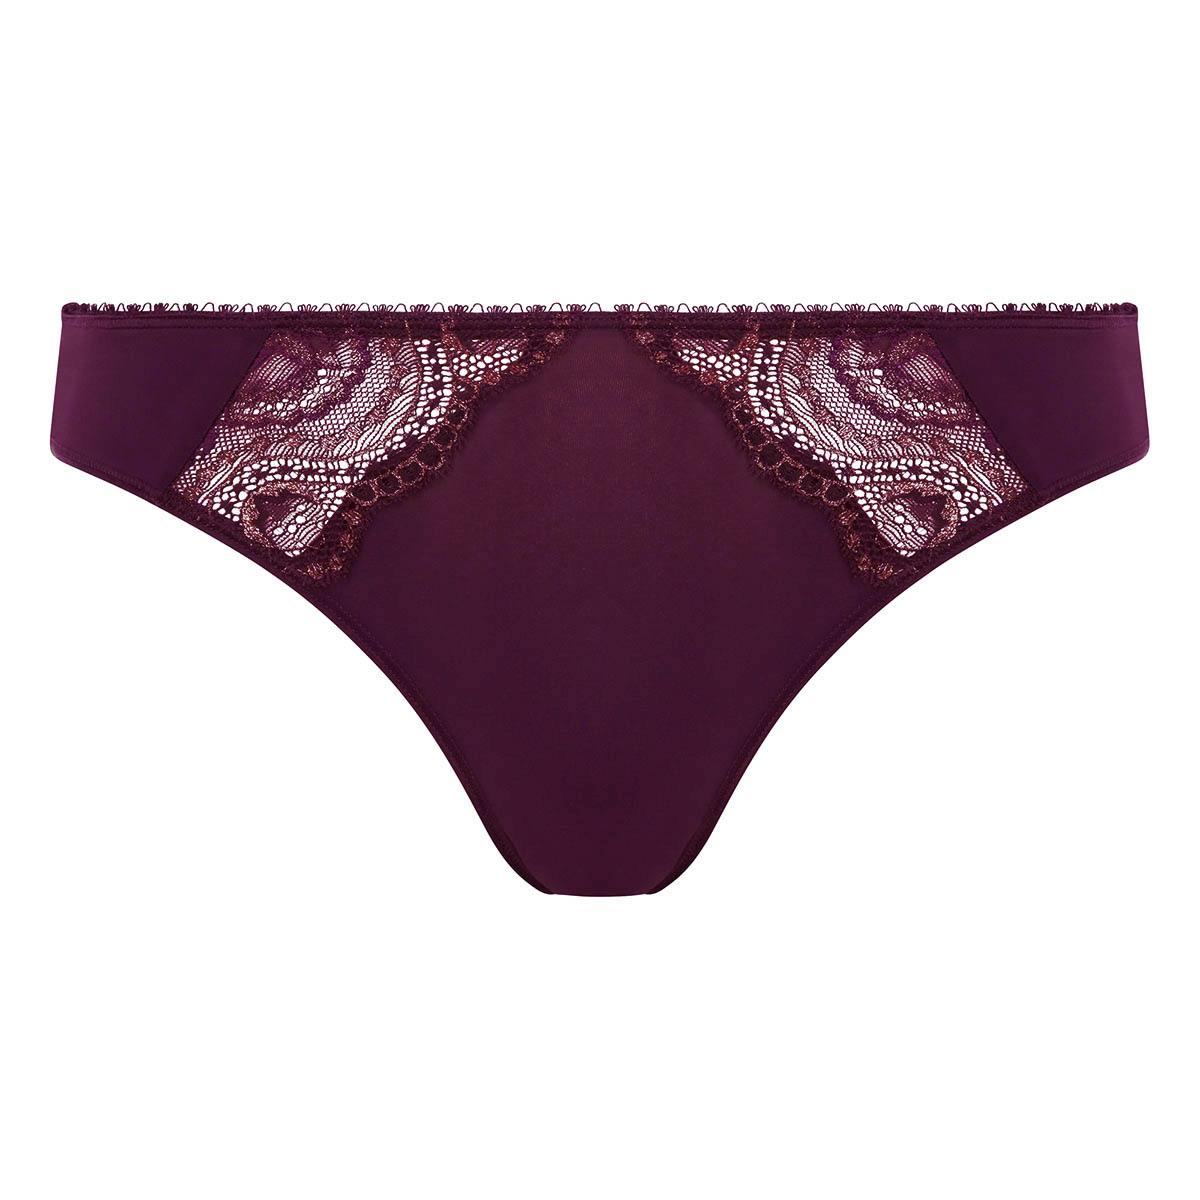 Culotte mini violette et doré Flower Elegance, , PLAYTEX